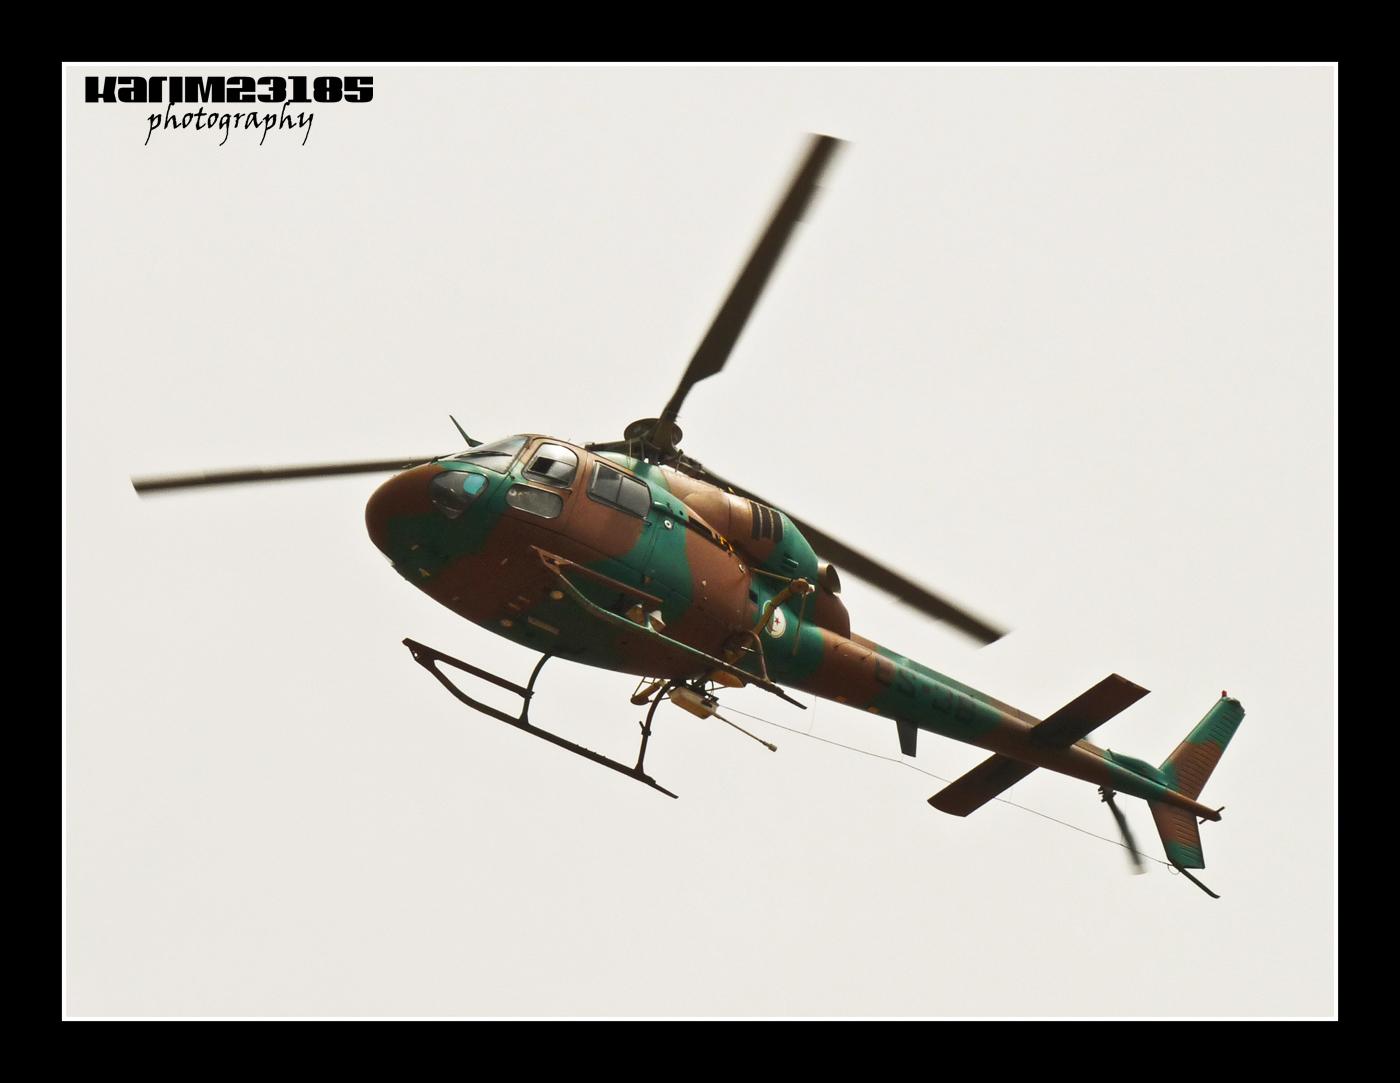 صور مروحيات القوات الجوية الجزائرية Ecureuil/Fennec ] AS-355N2 / AS-555N ] - صفحة 2 25493012533_a9e610397d_o